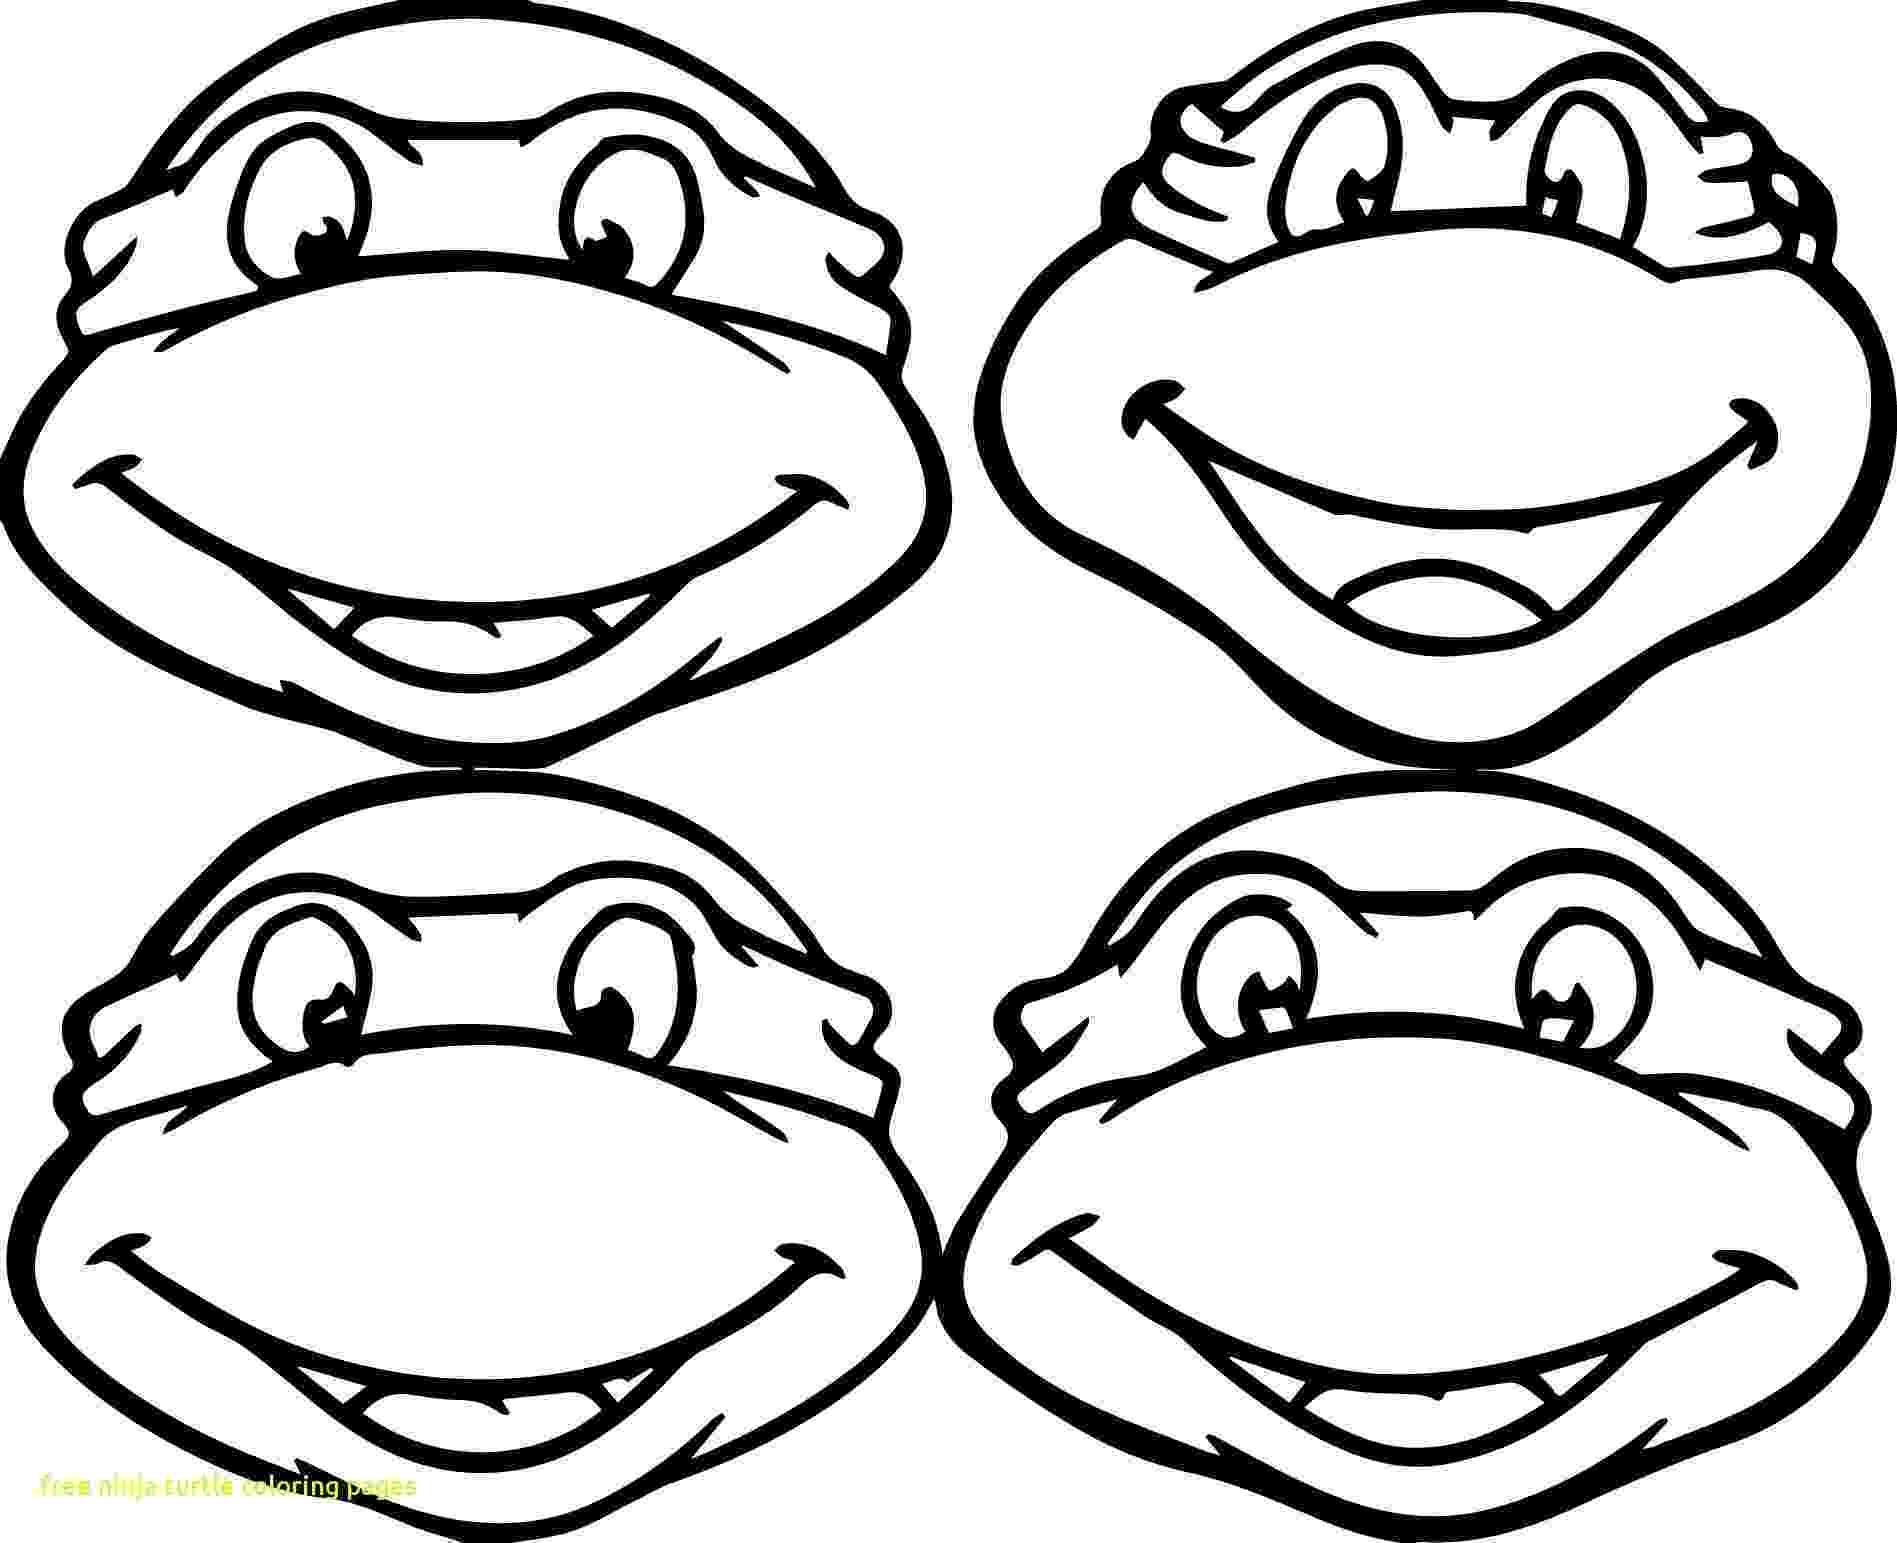 free ninja turtles coloring pages tmnt face coloring pages download coloring for kids 2019 coloring free pages turtles ninja